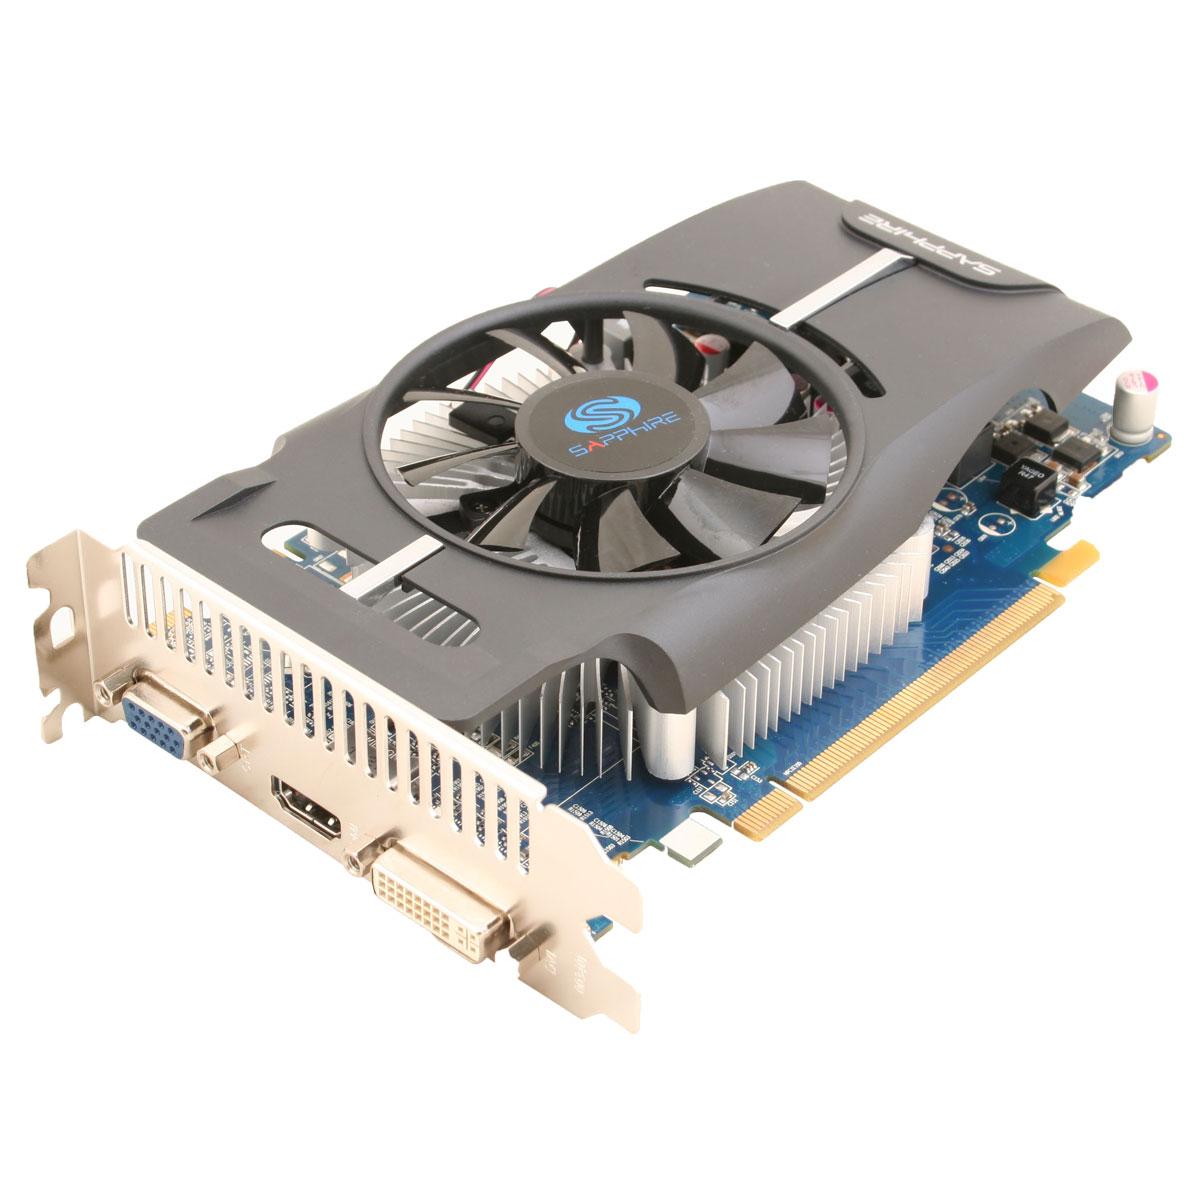 Carte graphique Sapphire Radeon HD 6770 1 Go 1 Go HDMI/DVI - PCI Express (AMD Radeon HD 6770)